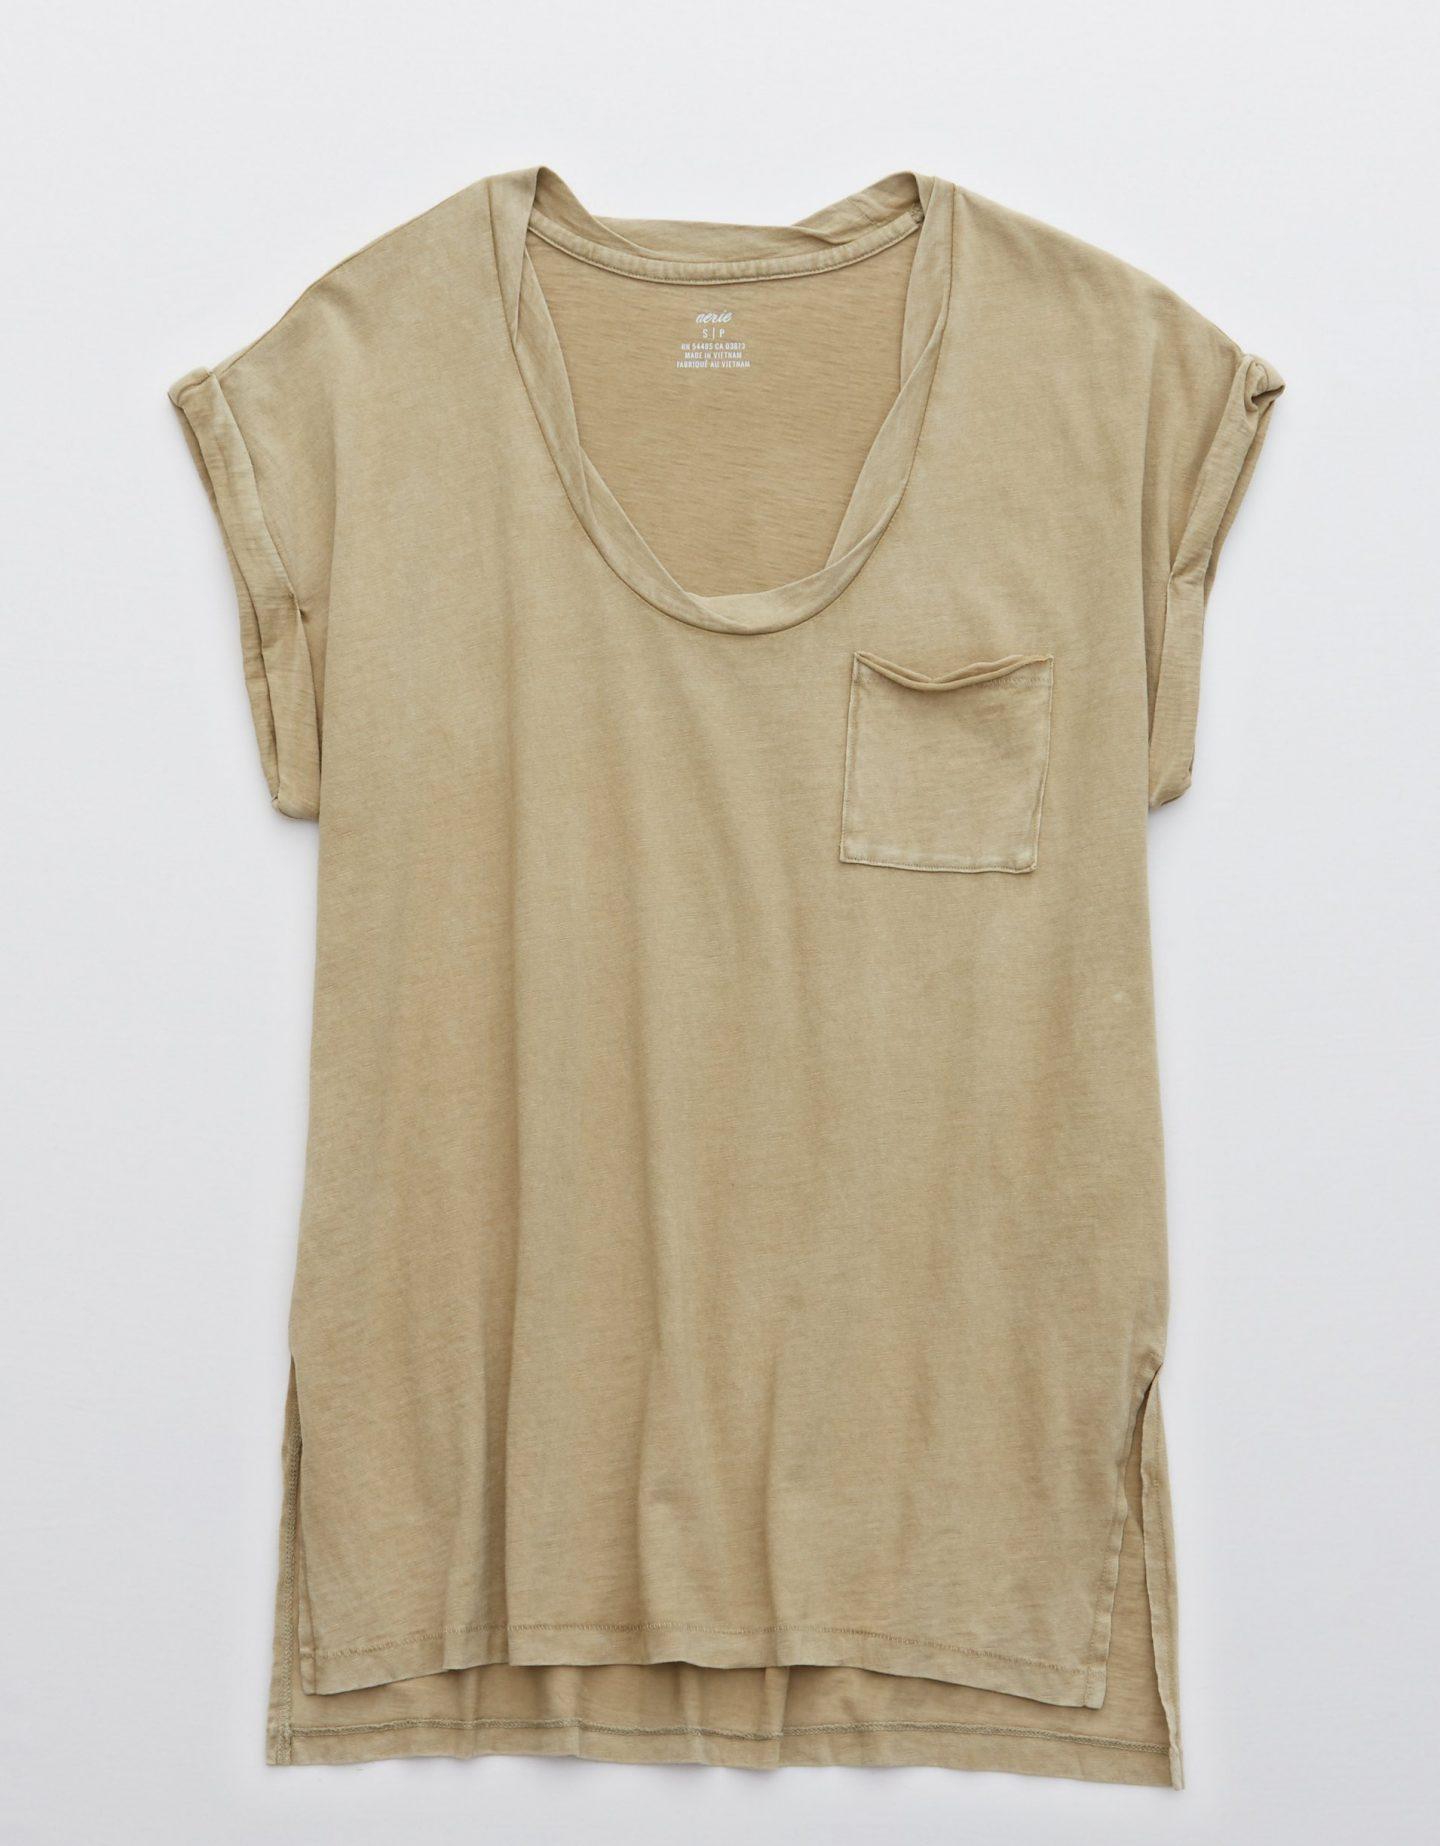 Beige oversized t-shirt with pocket